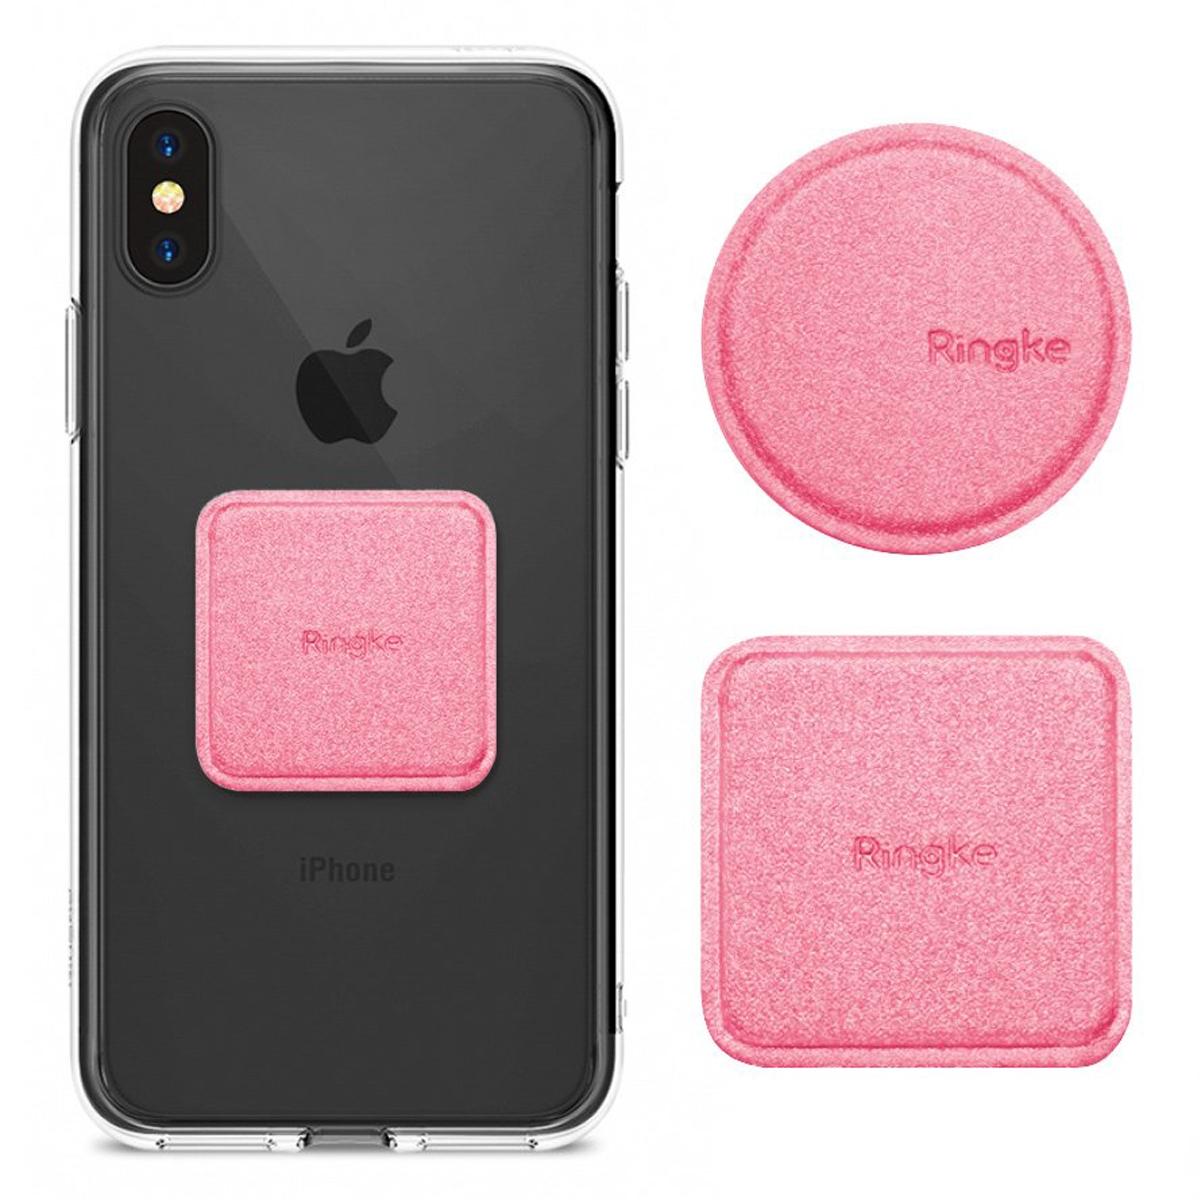 Ringke Magnetic Mount Metal Plate 2x PU Leder Metallplatten für magnetische Autohalterung rosa